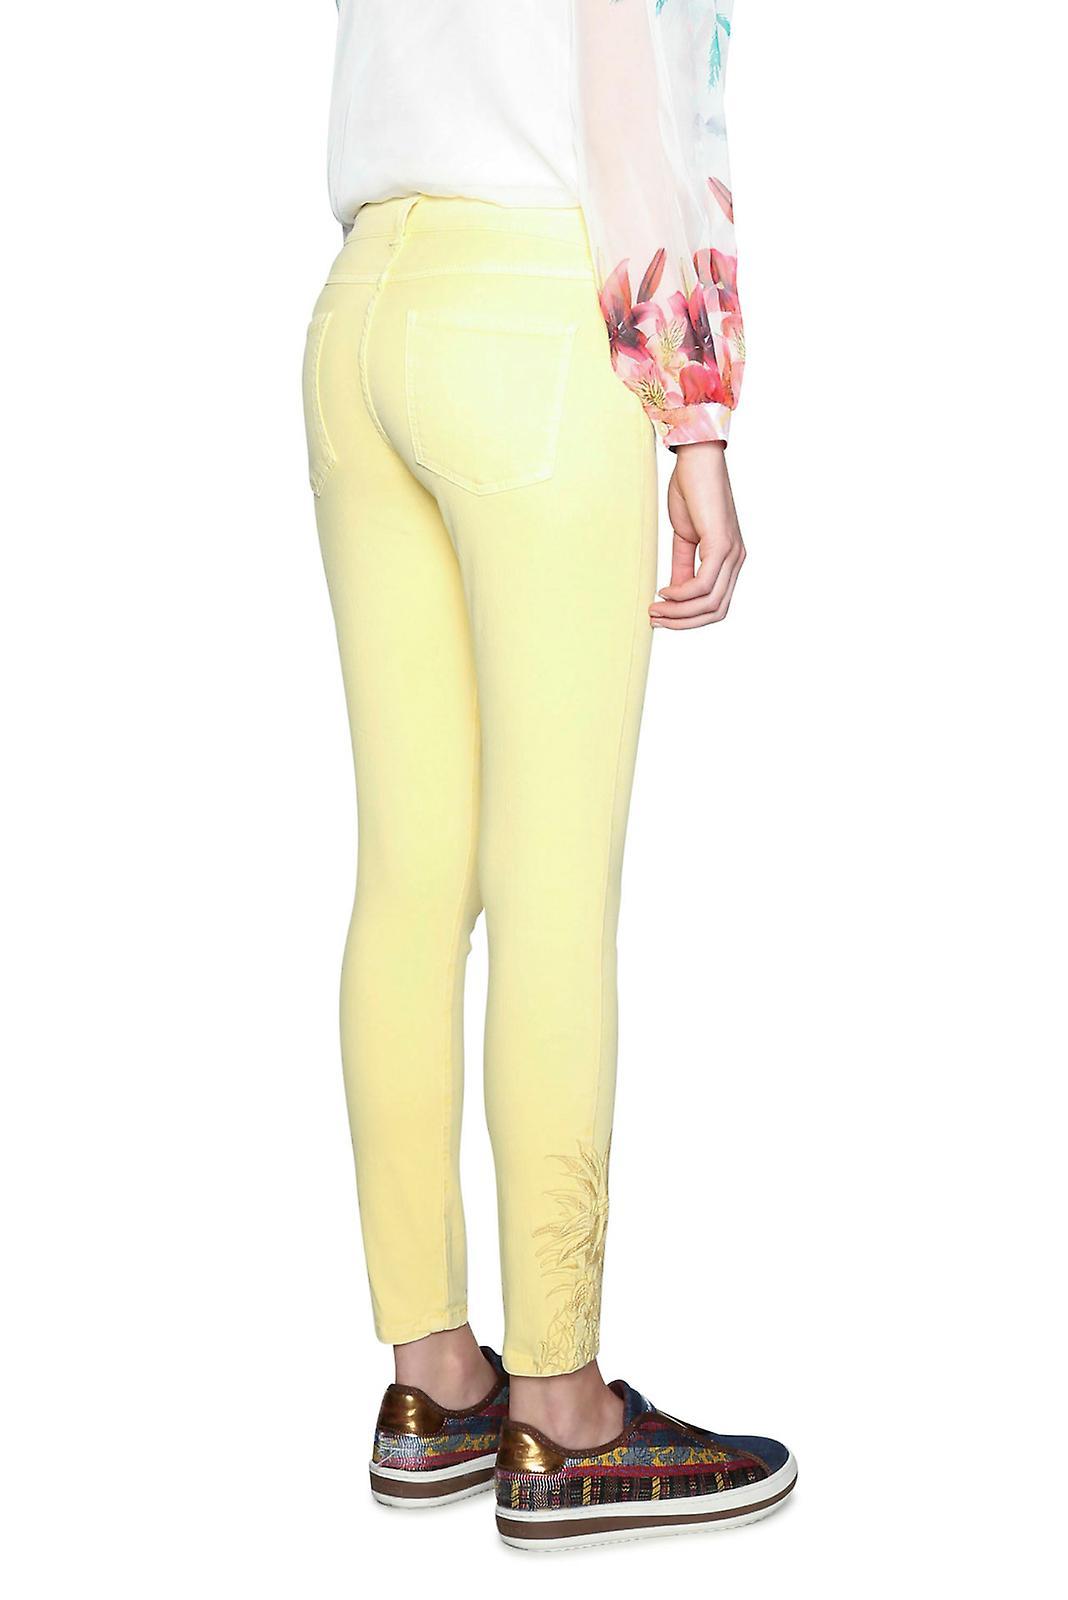 Desigual Femmes apos;s Emerick Skinny Jeans 30xFou